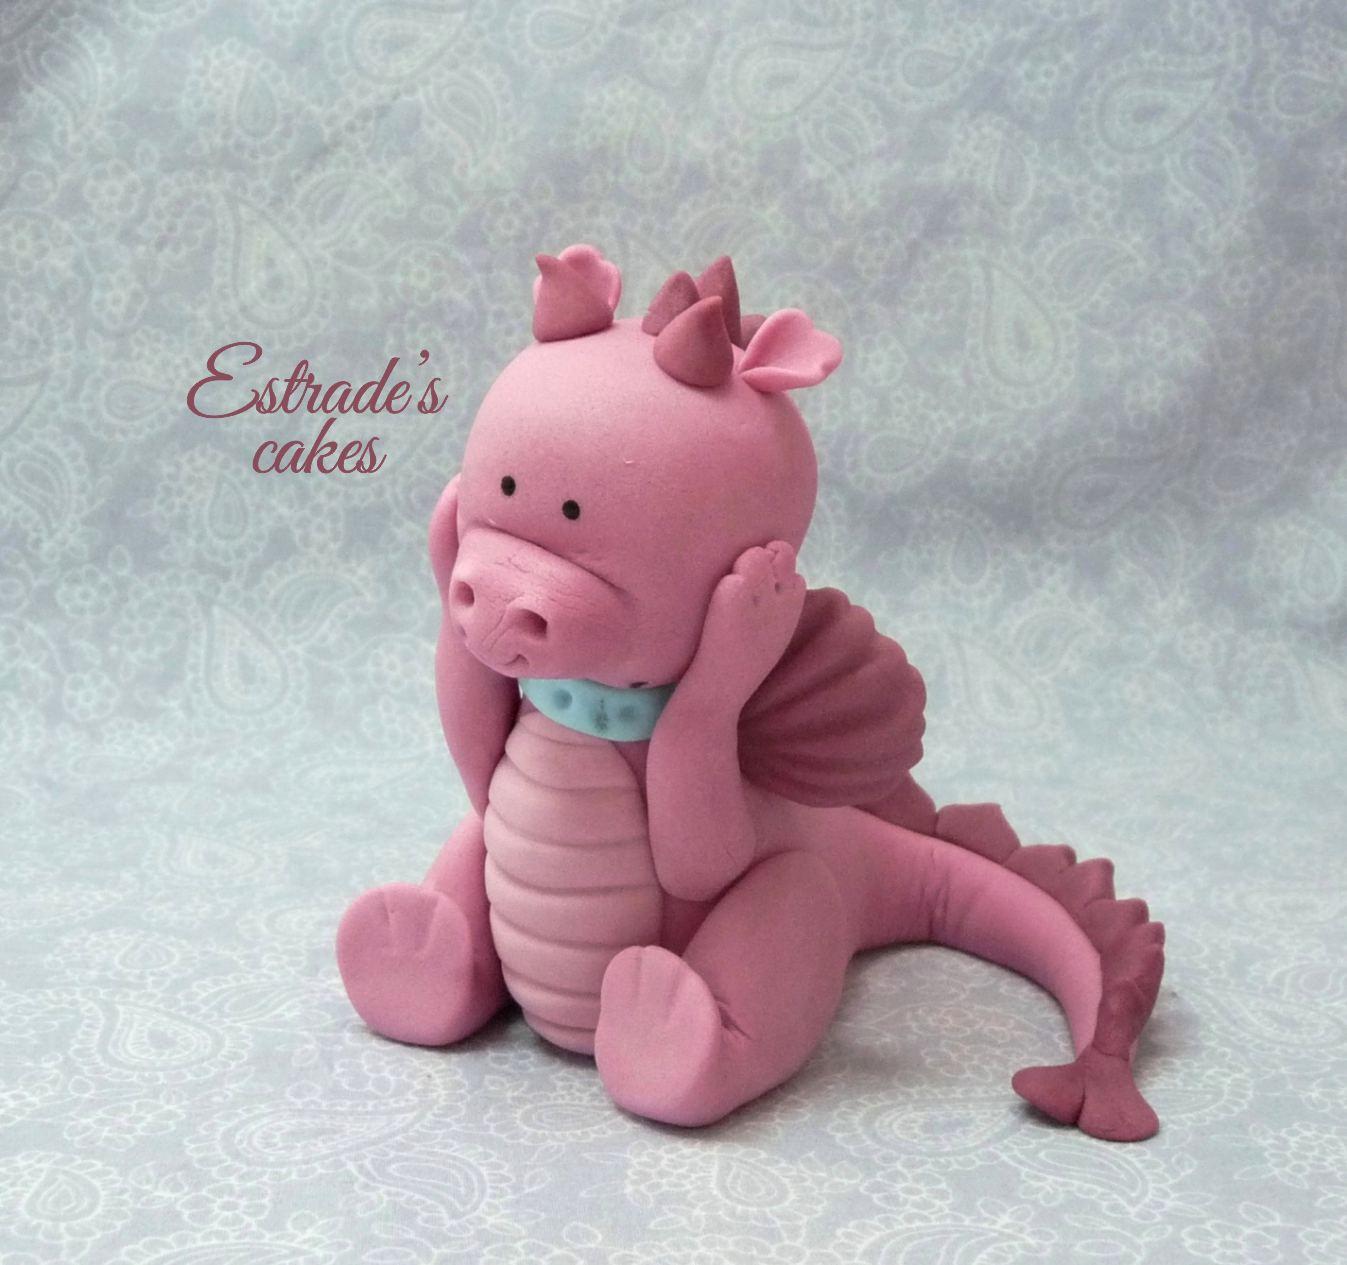 dragón en azúcar - 1